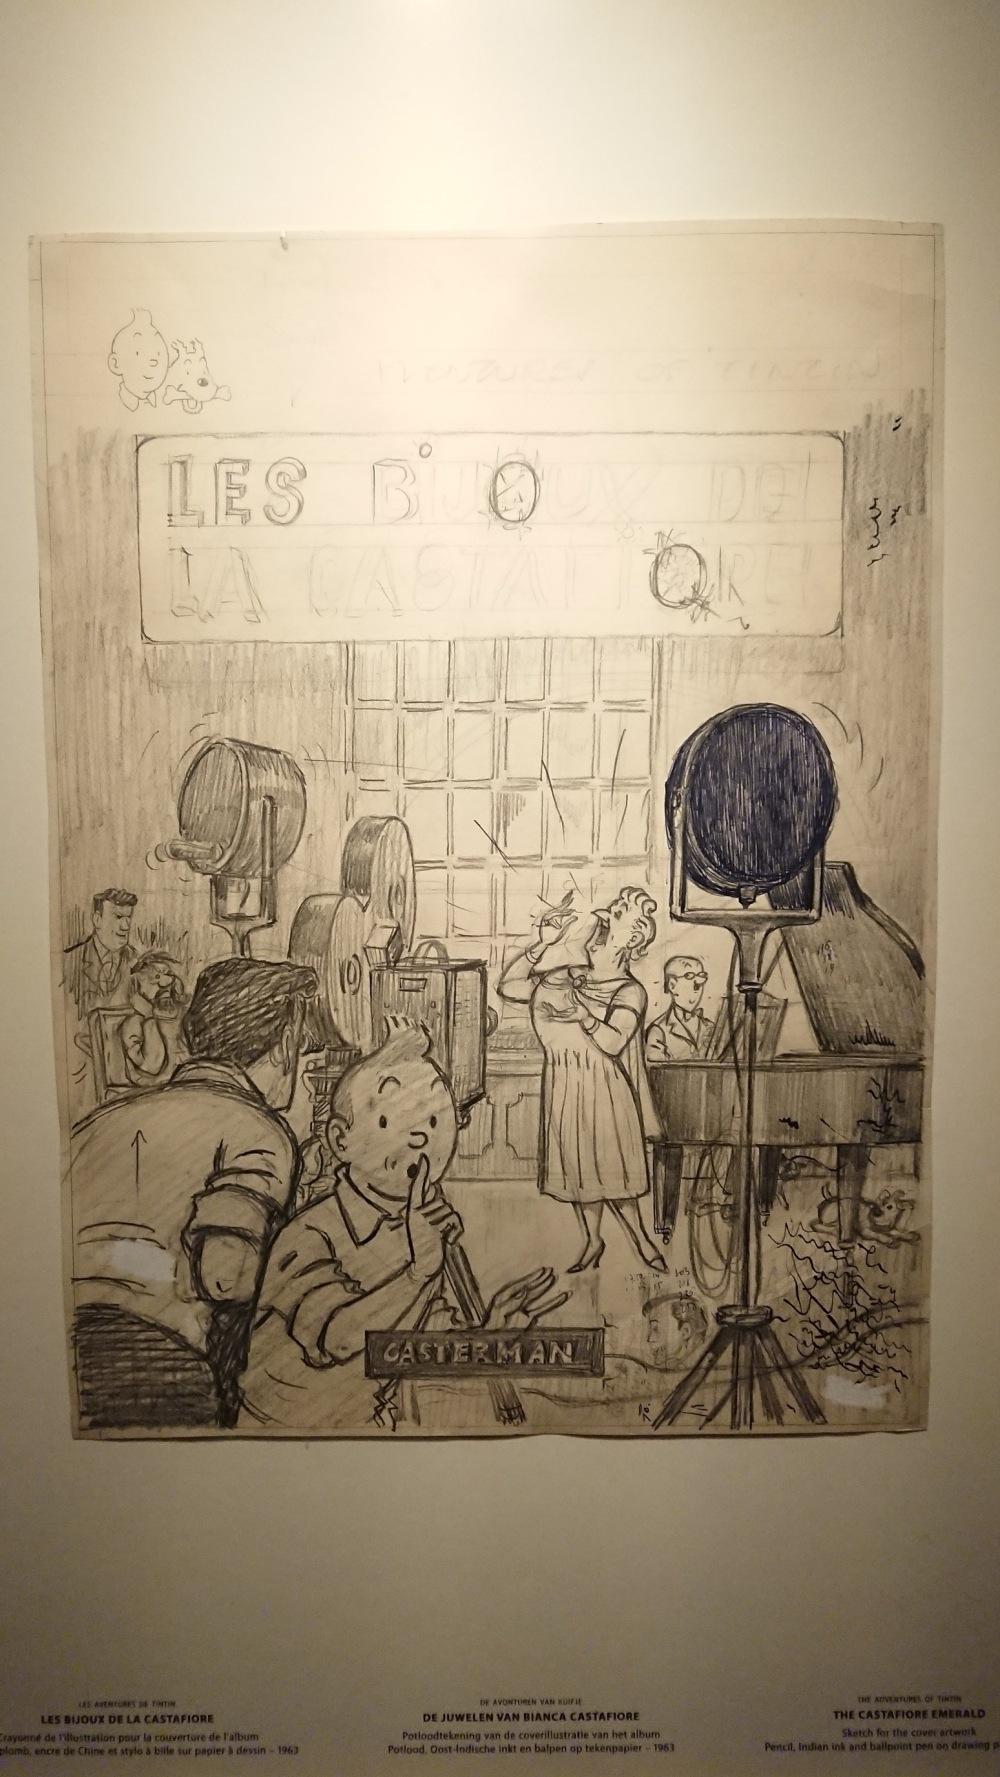 #tenten #tintin #herge #belçika #belgium #hergemuseum #kastafioreninmücevherleri #LesBijouxdelaCastafiore #biancacastafiore